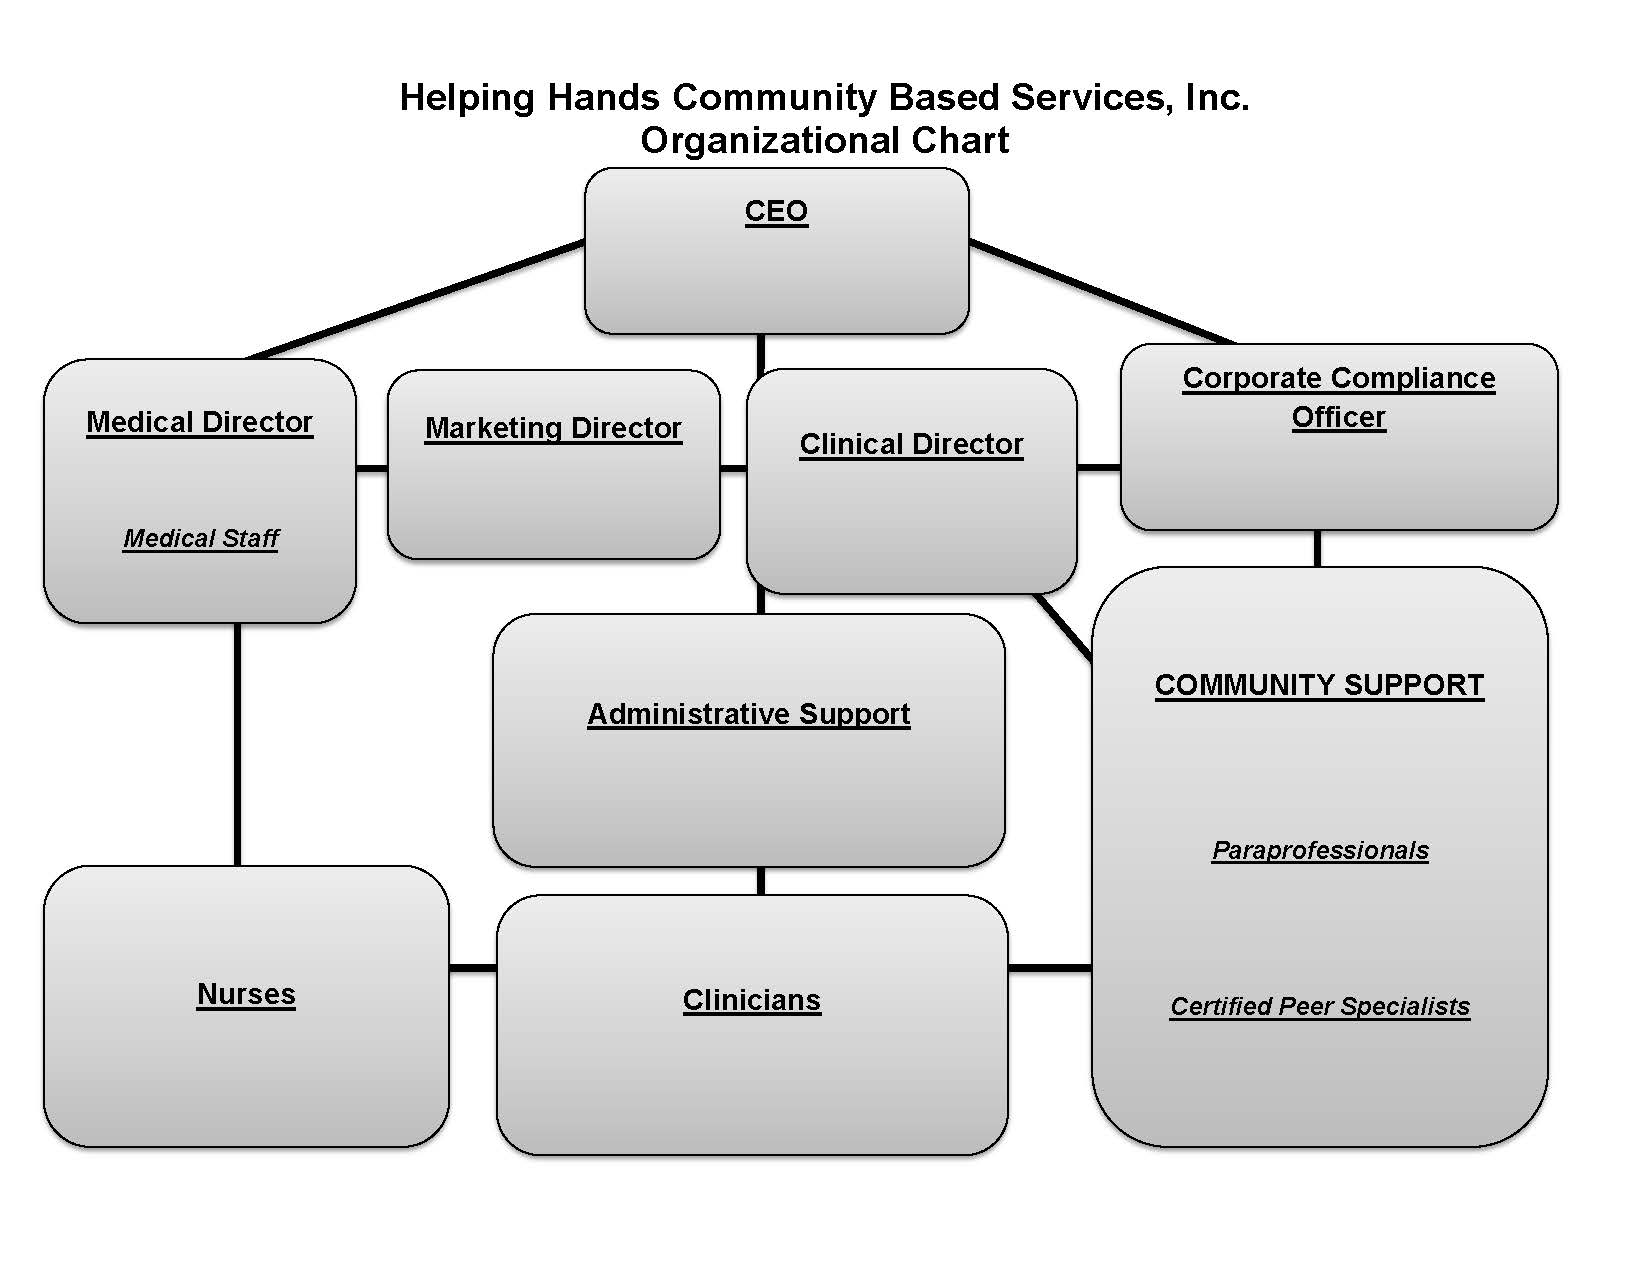 Organizational Chart Update  02-27-2014